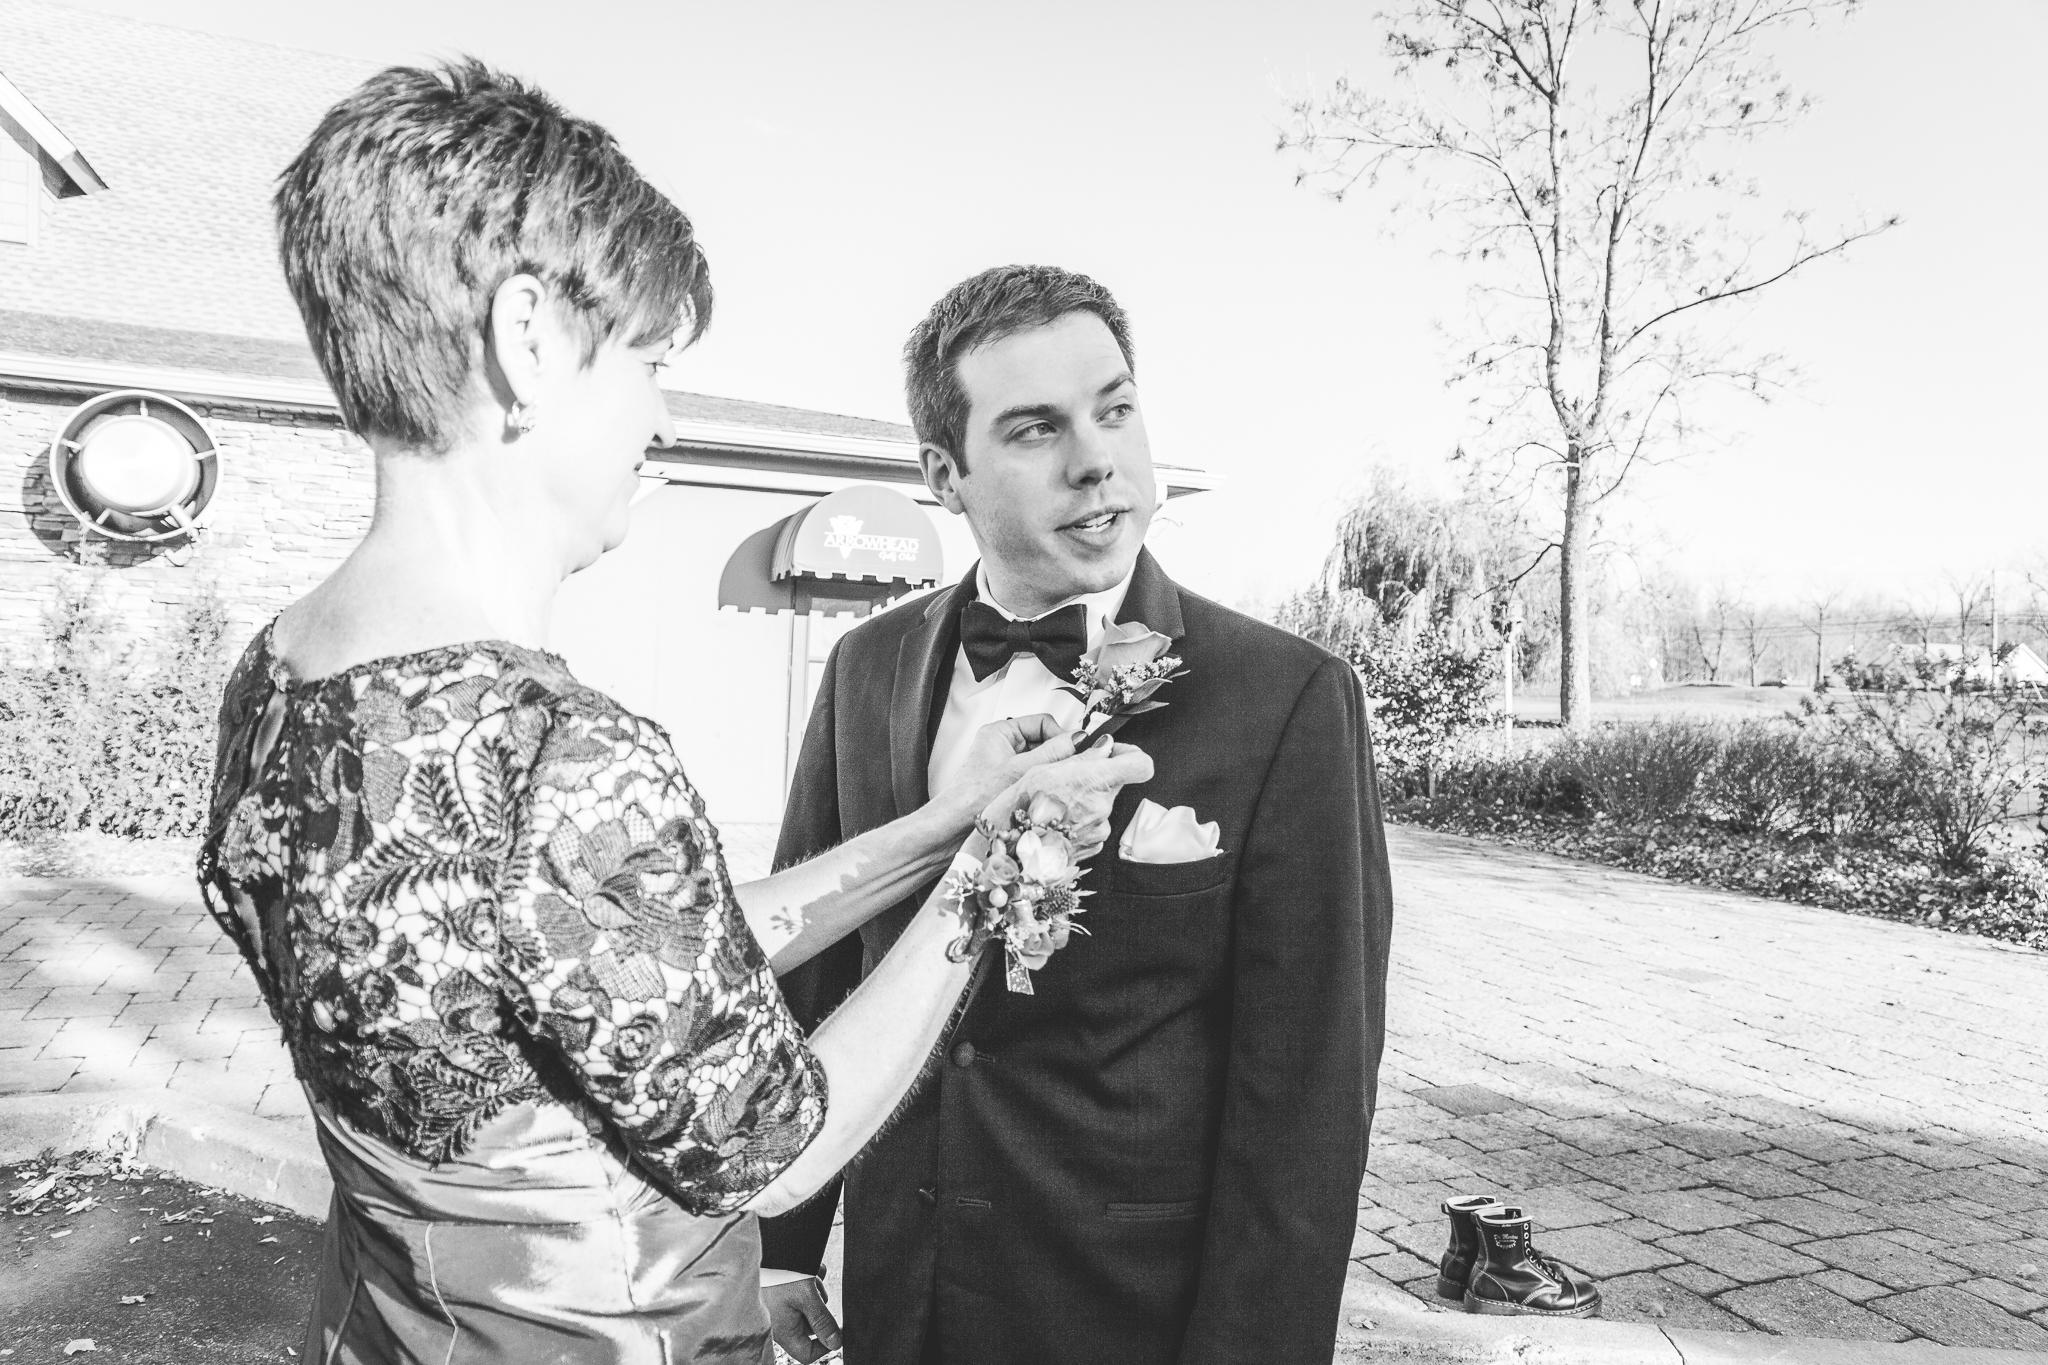 camuglia-whomstudio-chelsea_and_andy-nycphotographer-wedding-brooklyn-buffalo-timberlodge-021-0086.jpg